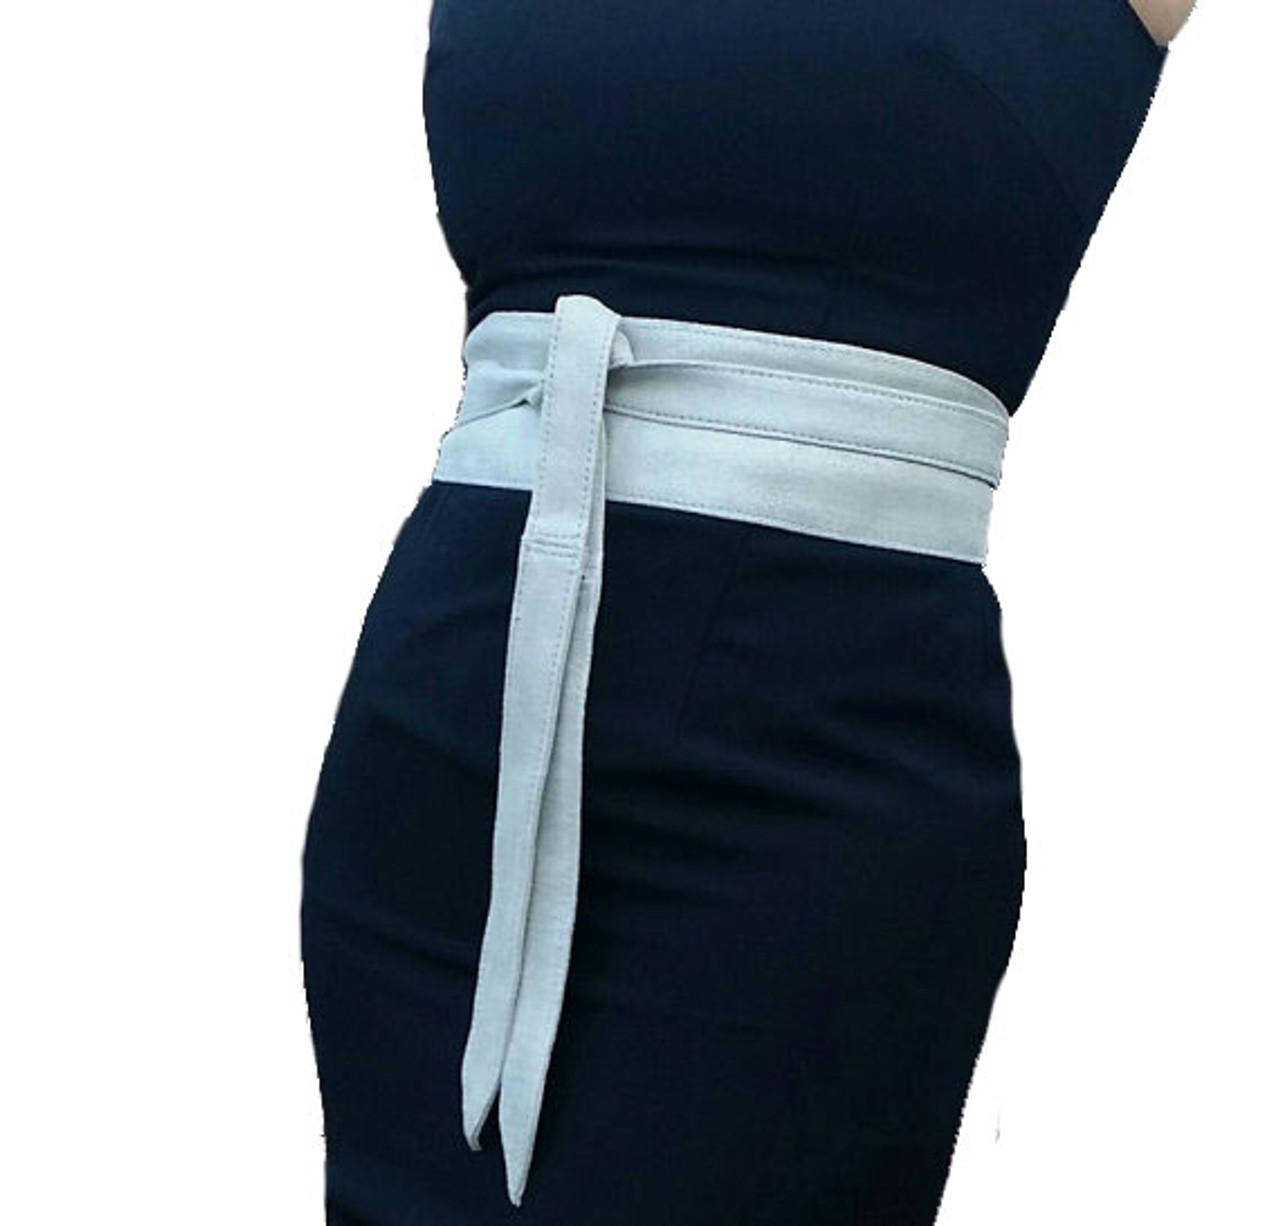 ab3c9e4bc Suede Leather Obi Belt - Wide Wrap Belts - Women s tie belts - Wedding  Wraparound Unique Belts - Fgalaze Genuine Leather Bags   Accessories